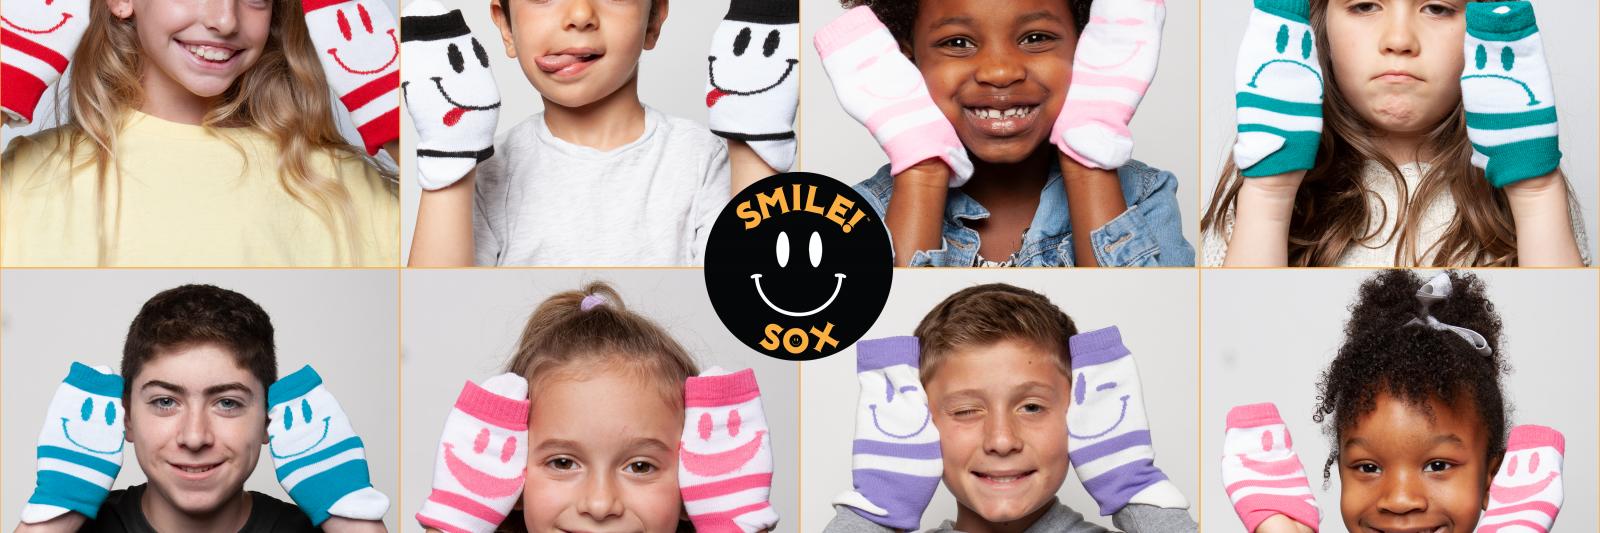 SMILE! SOX™